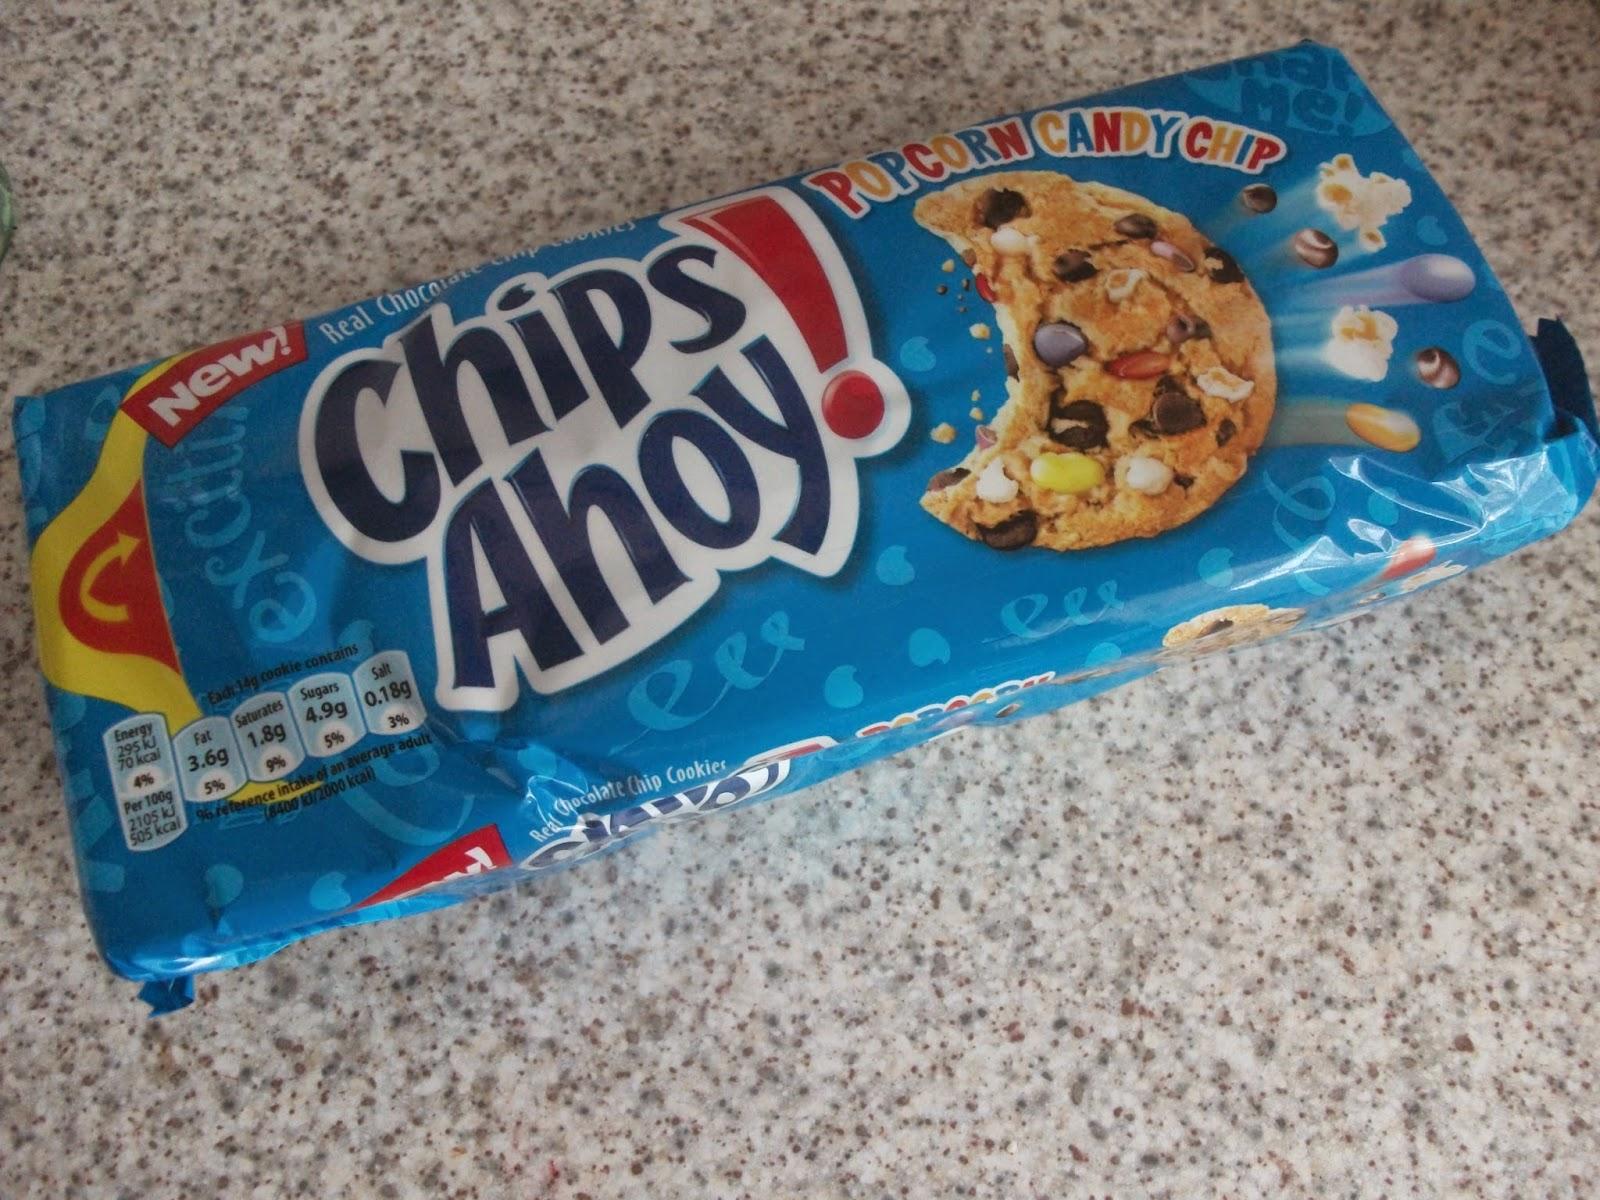 Chips Ahoy Cookies uk Chips Ahoy Cookies Popcorn